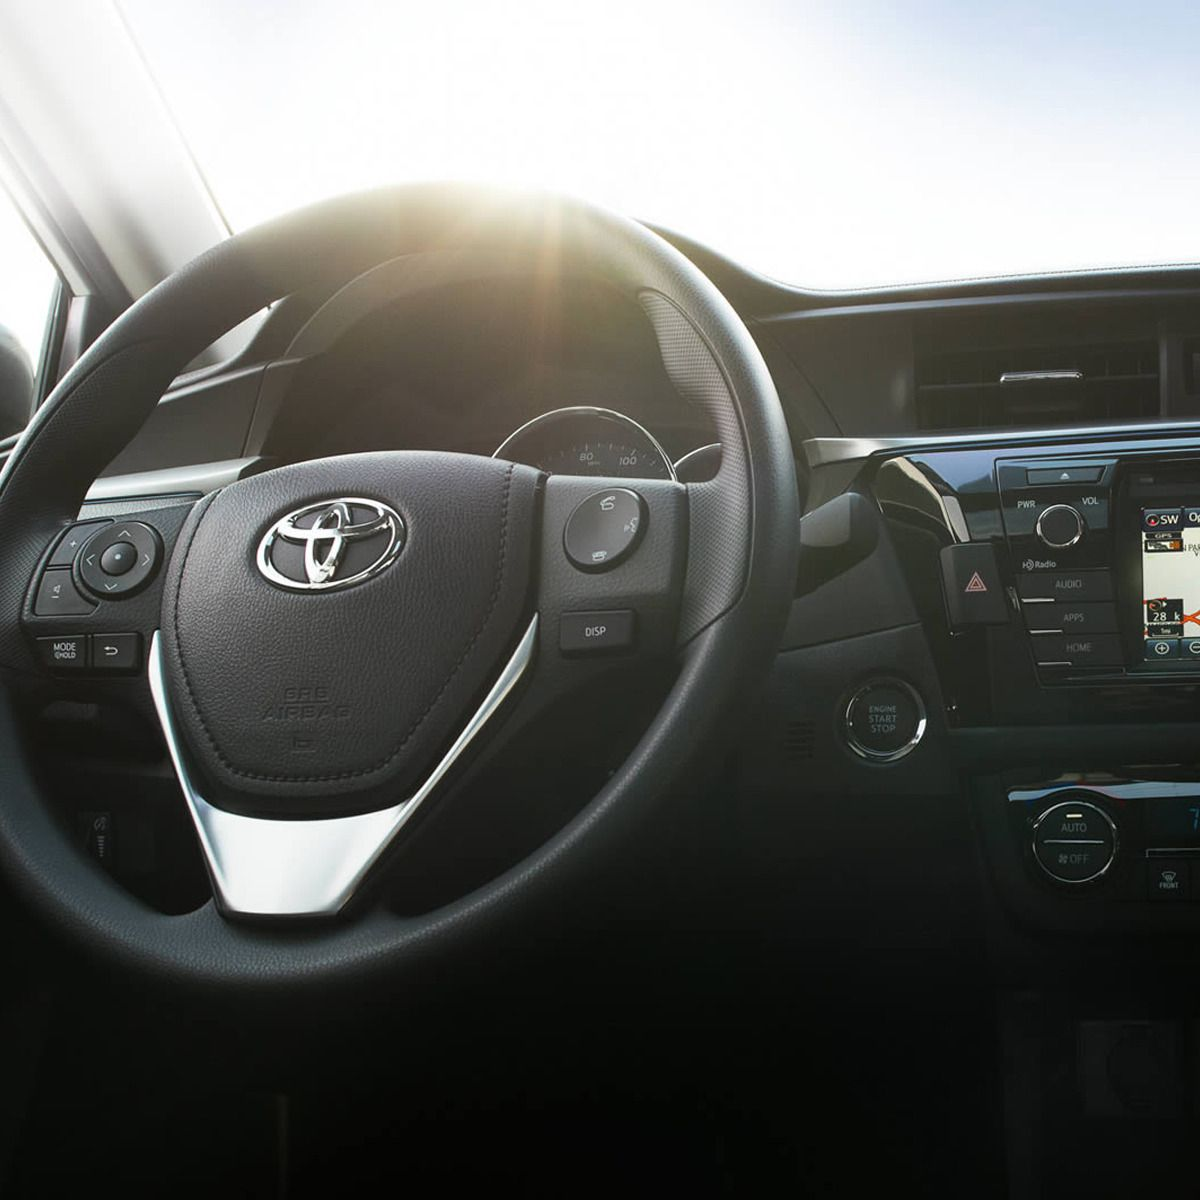 Toyota Corolla Toyota dealers, Toyota, Toyota corolla